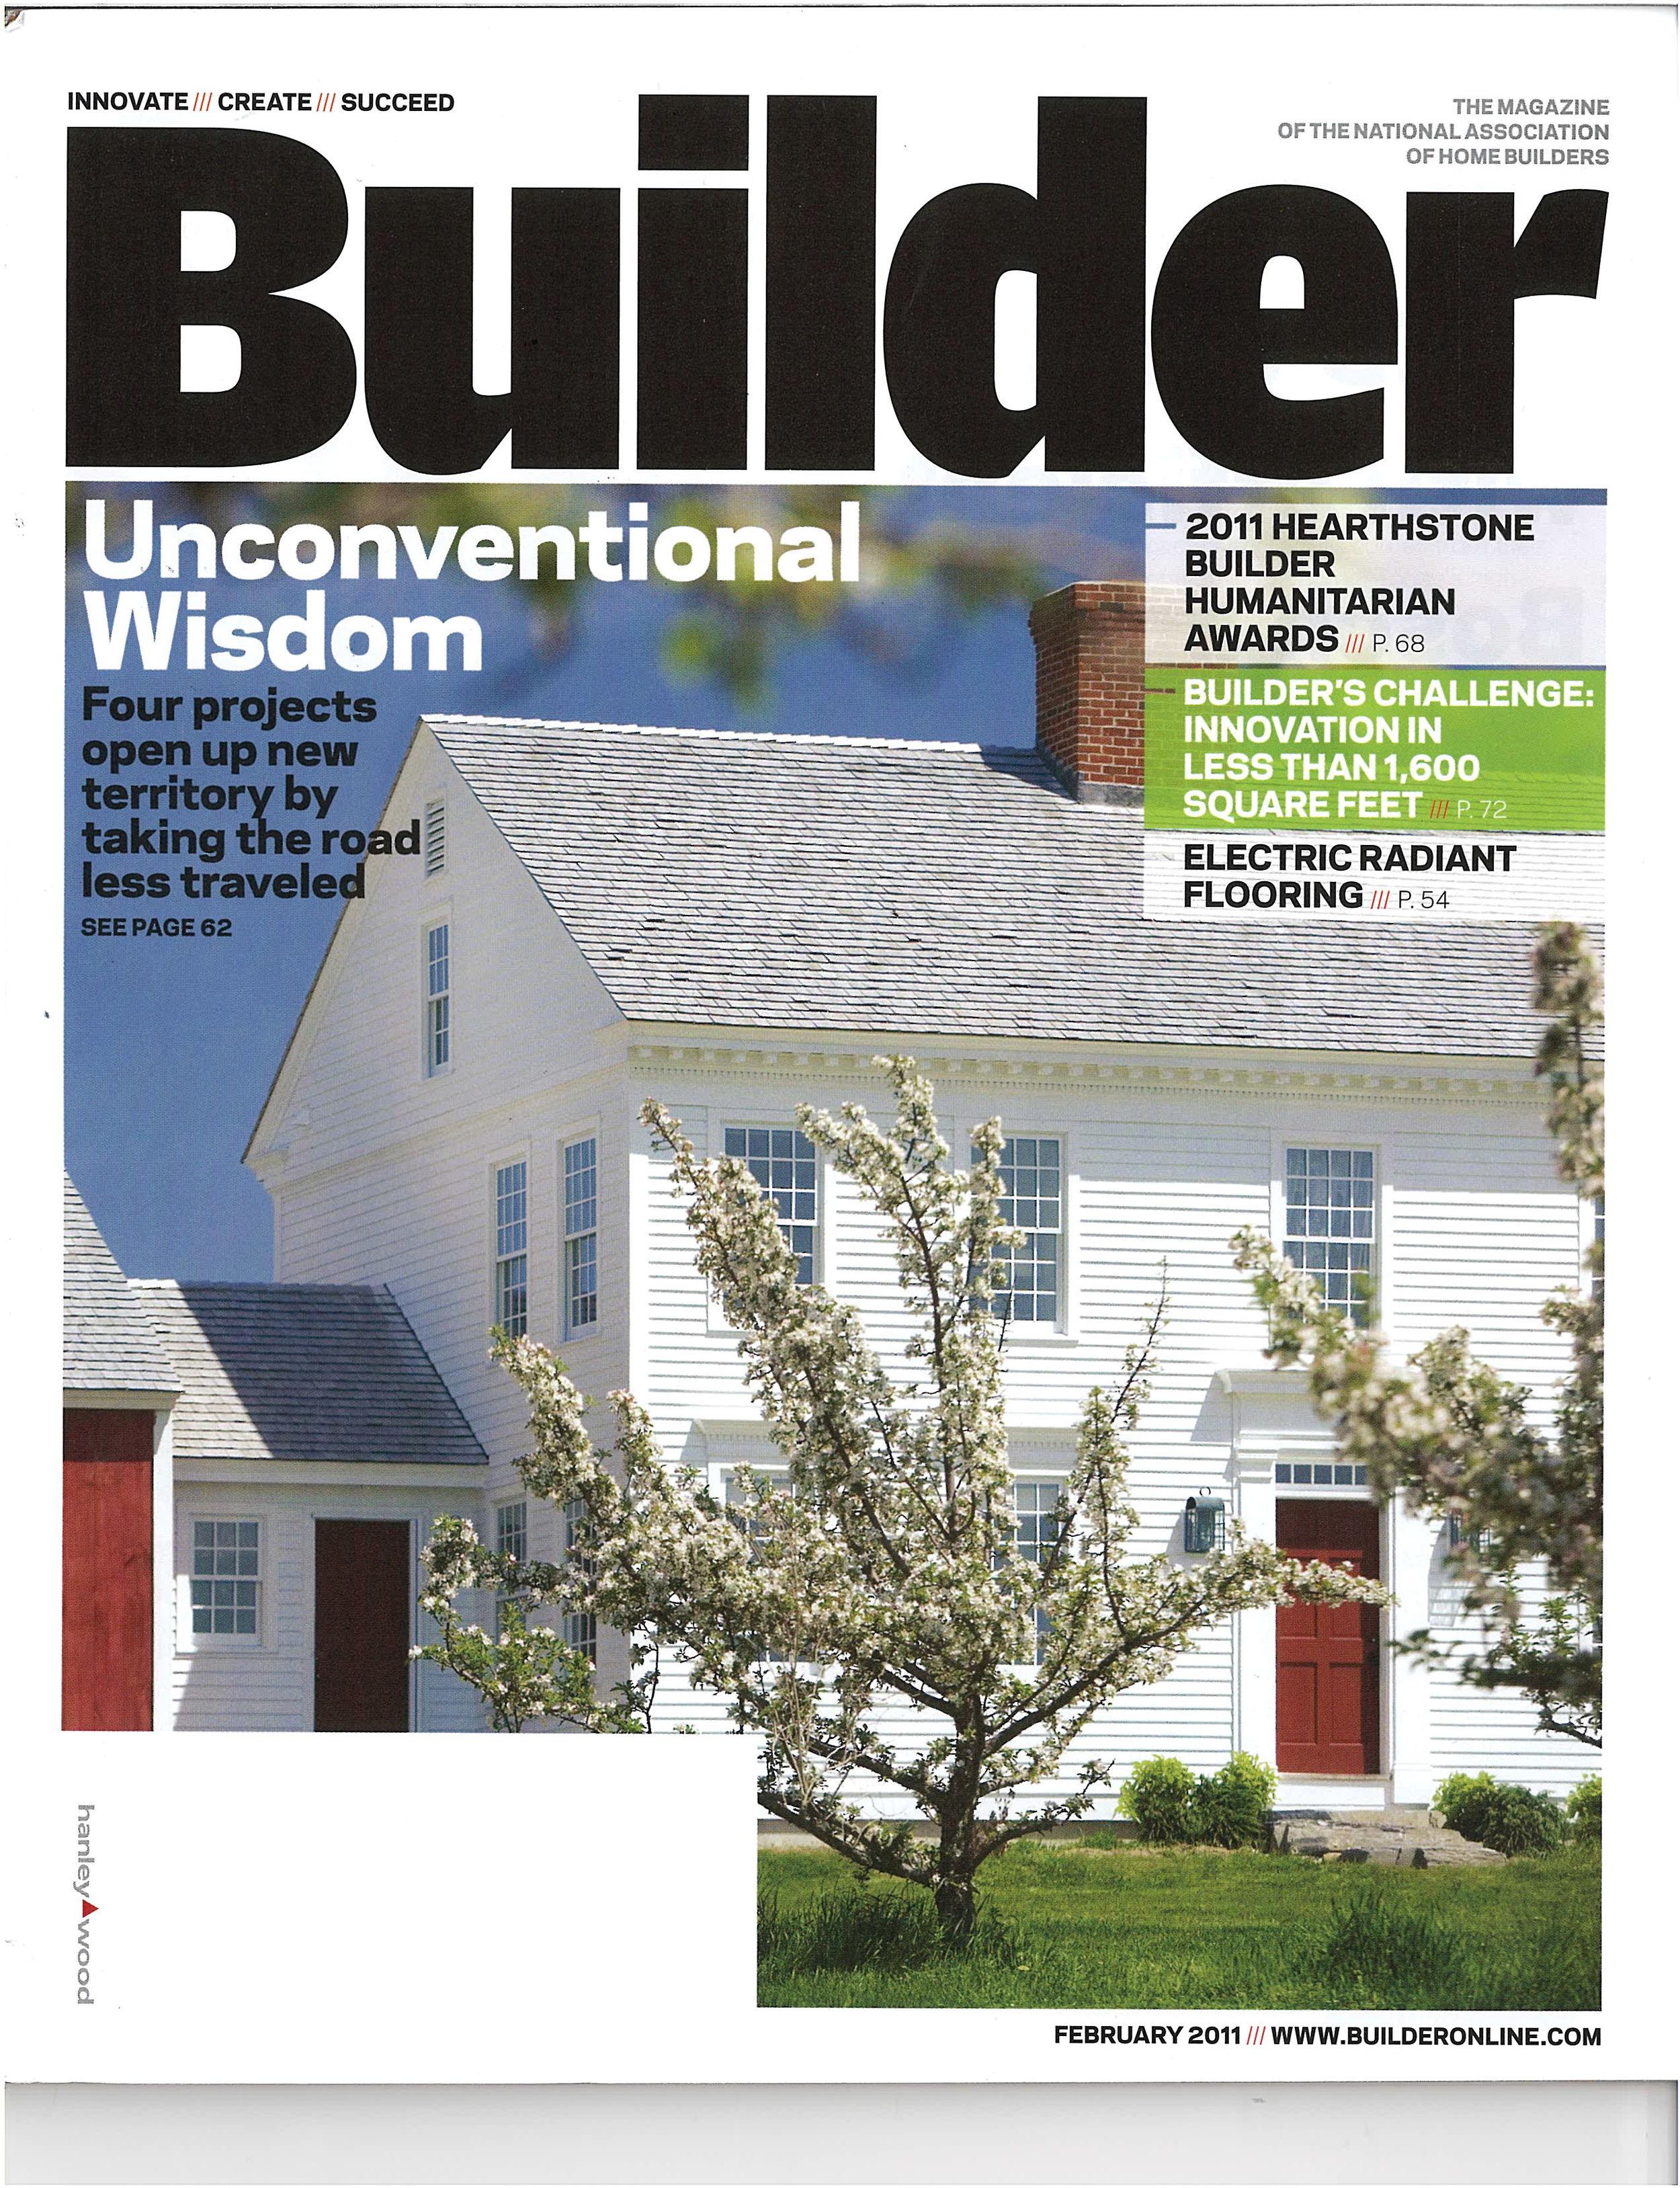 02-2011_BuilderMagazine_ImagineThat_Page_1.jpg